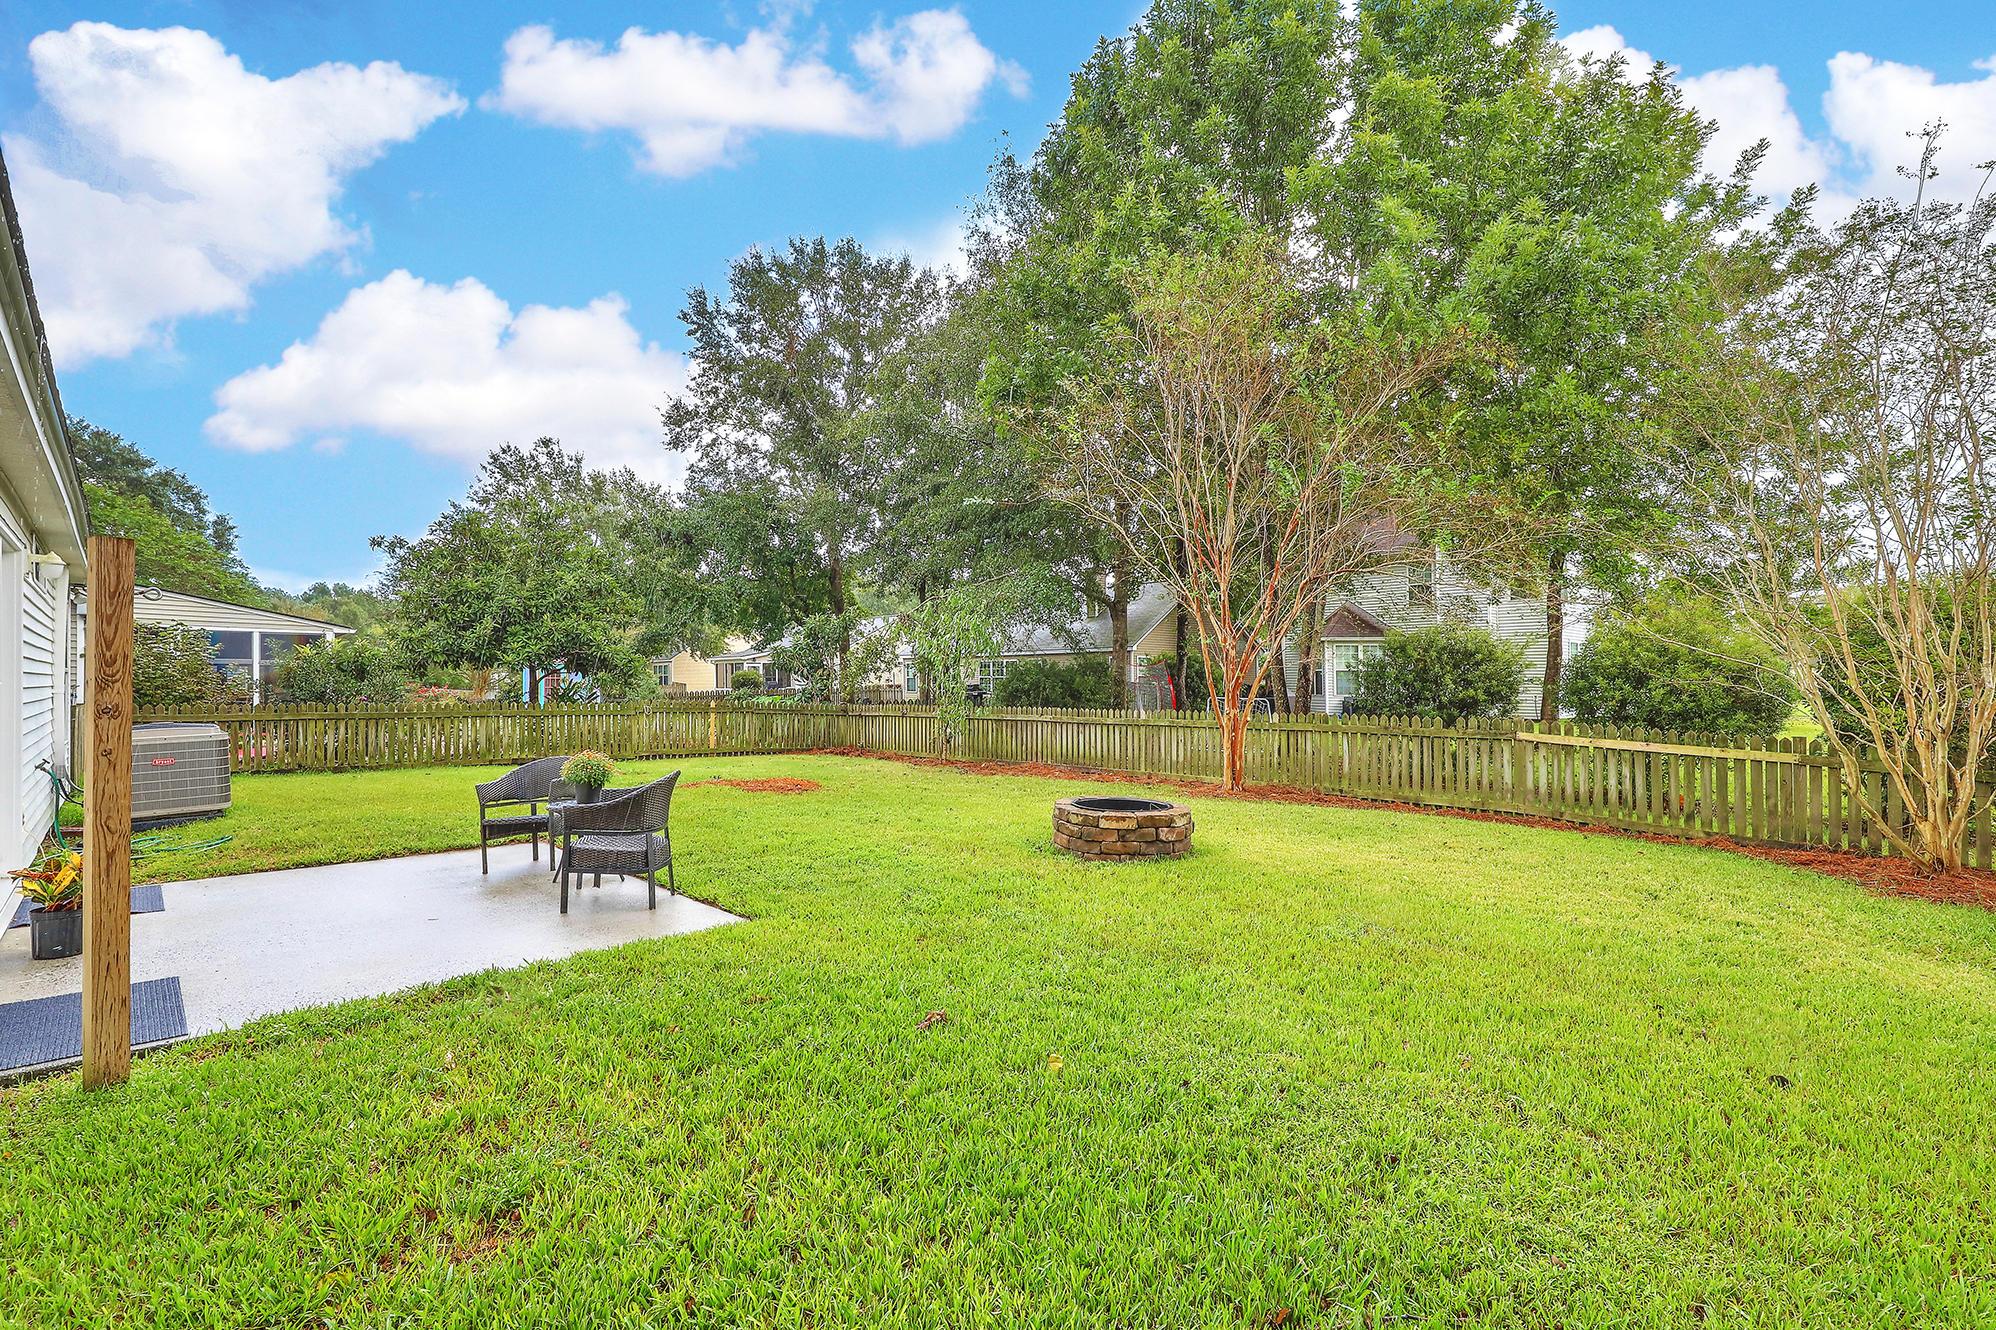 Planters Pointe Homes For Sale - 2951 Loebs, Mount Pleasant, SC - 19